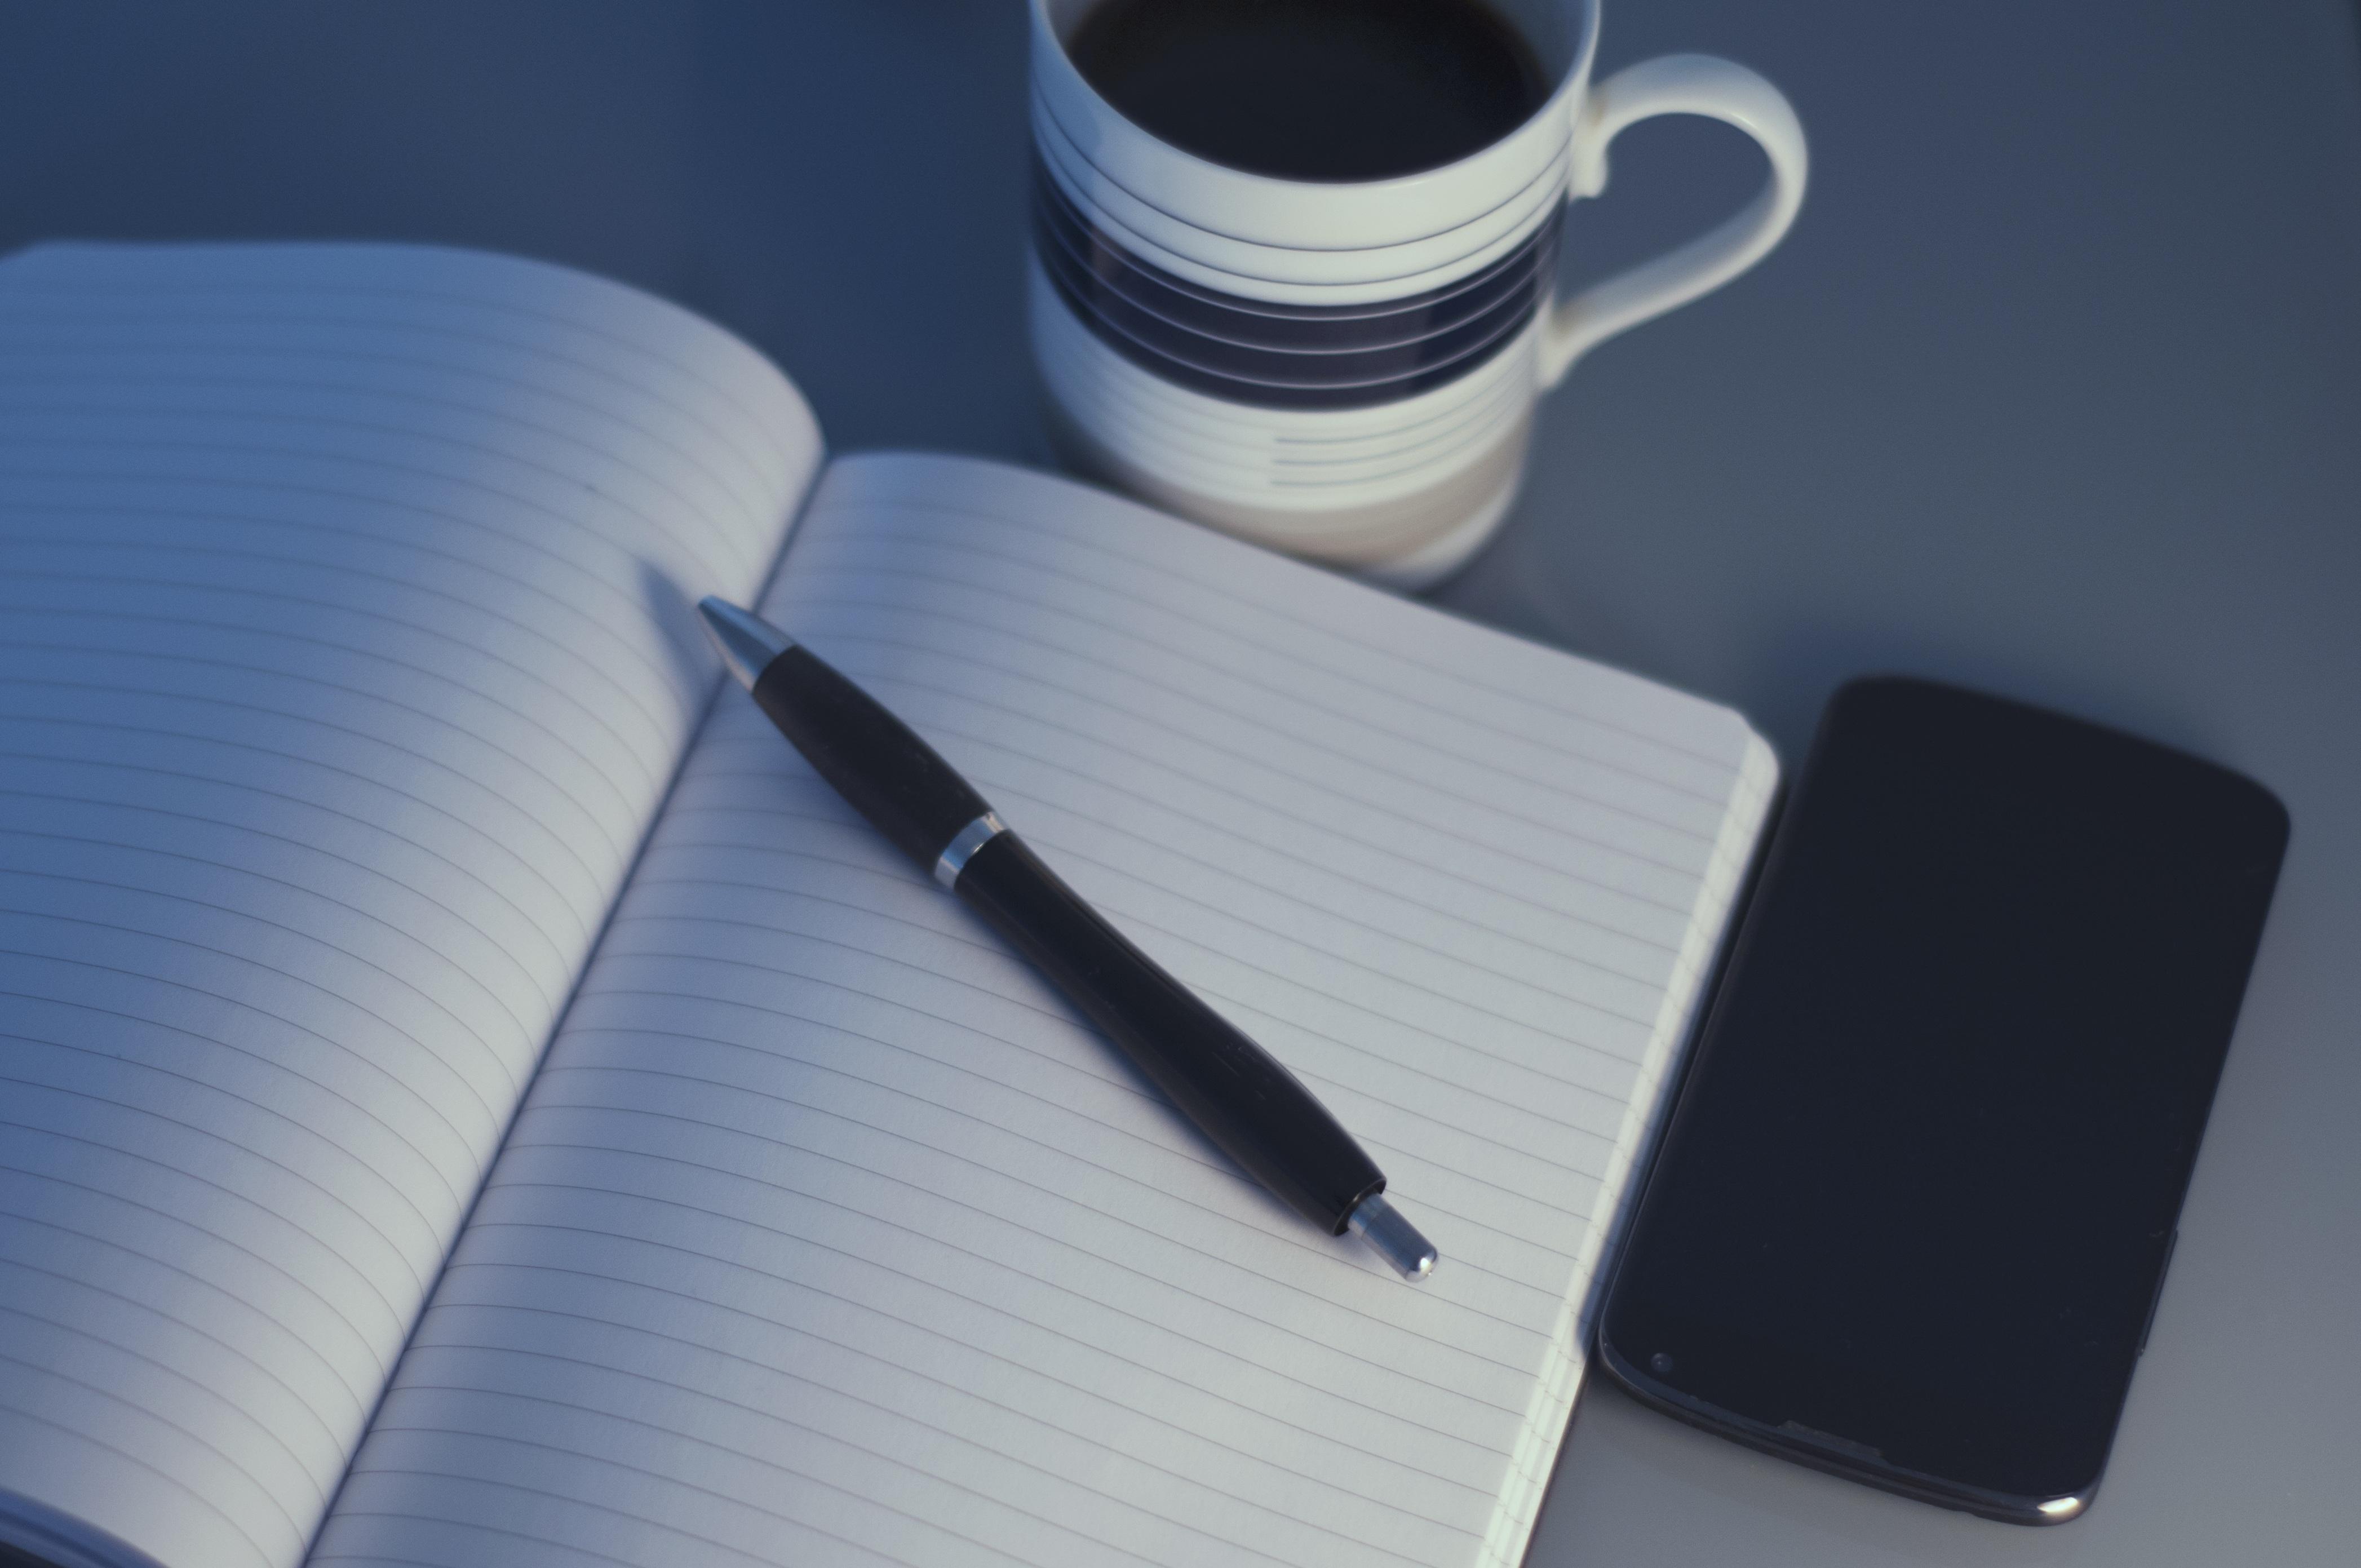 Ручка с блокнотом картинка